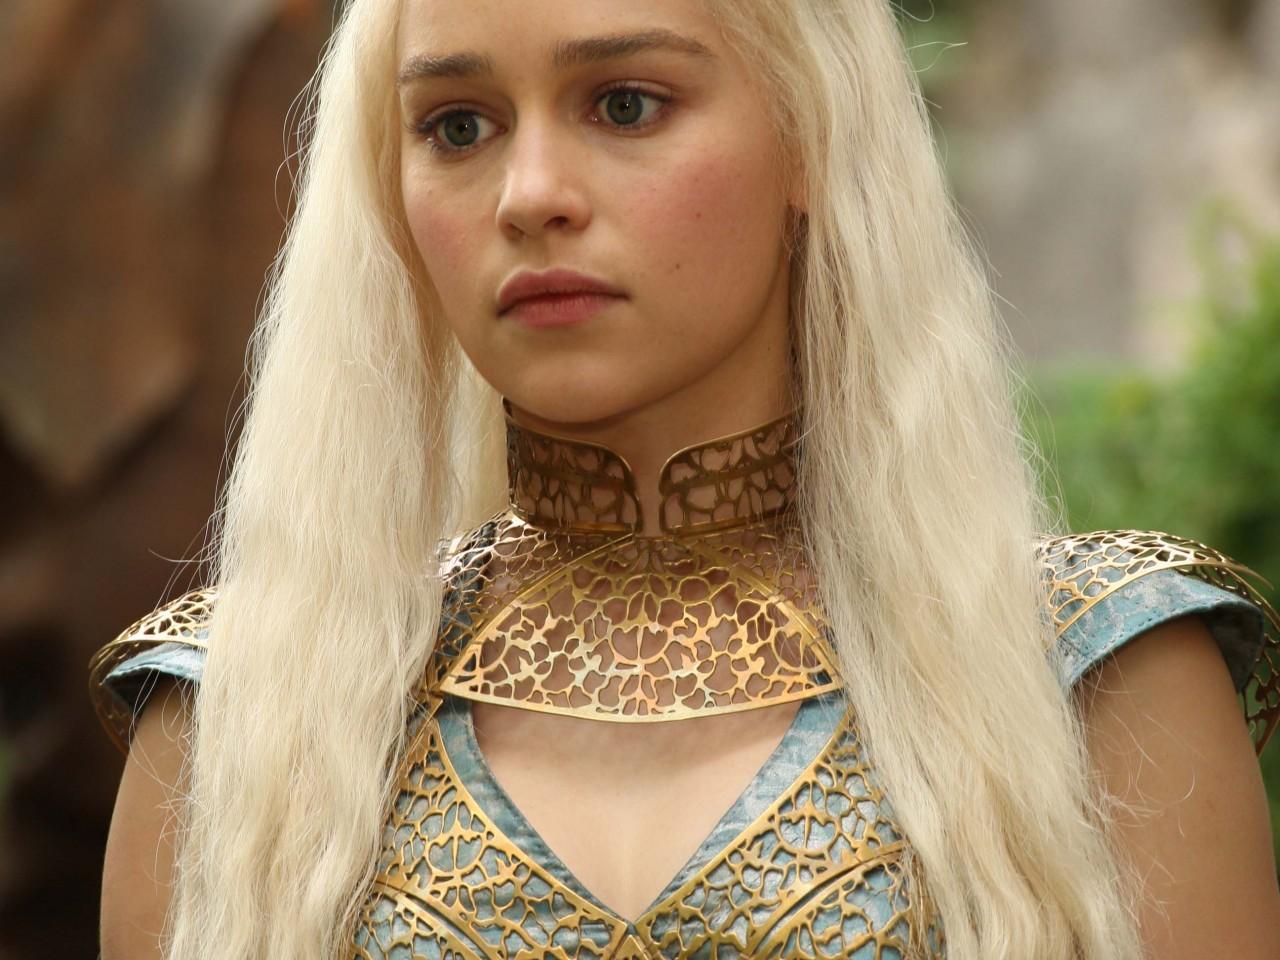 Daenerys Targaryen Game Of Thrones Hd Wallpaper Hd Wallpapers